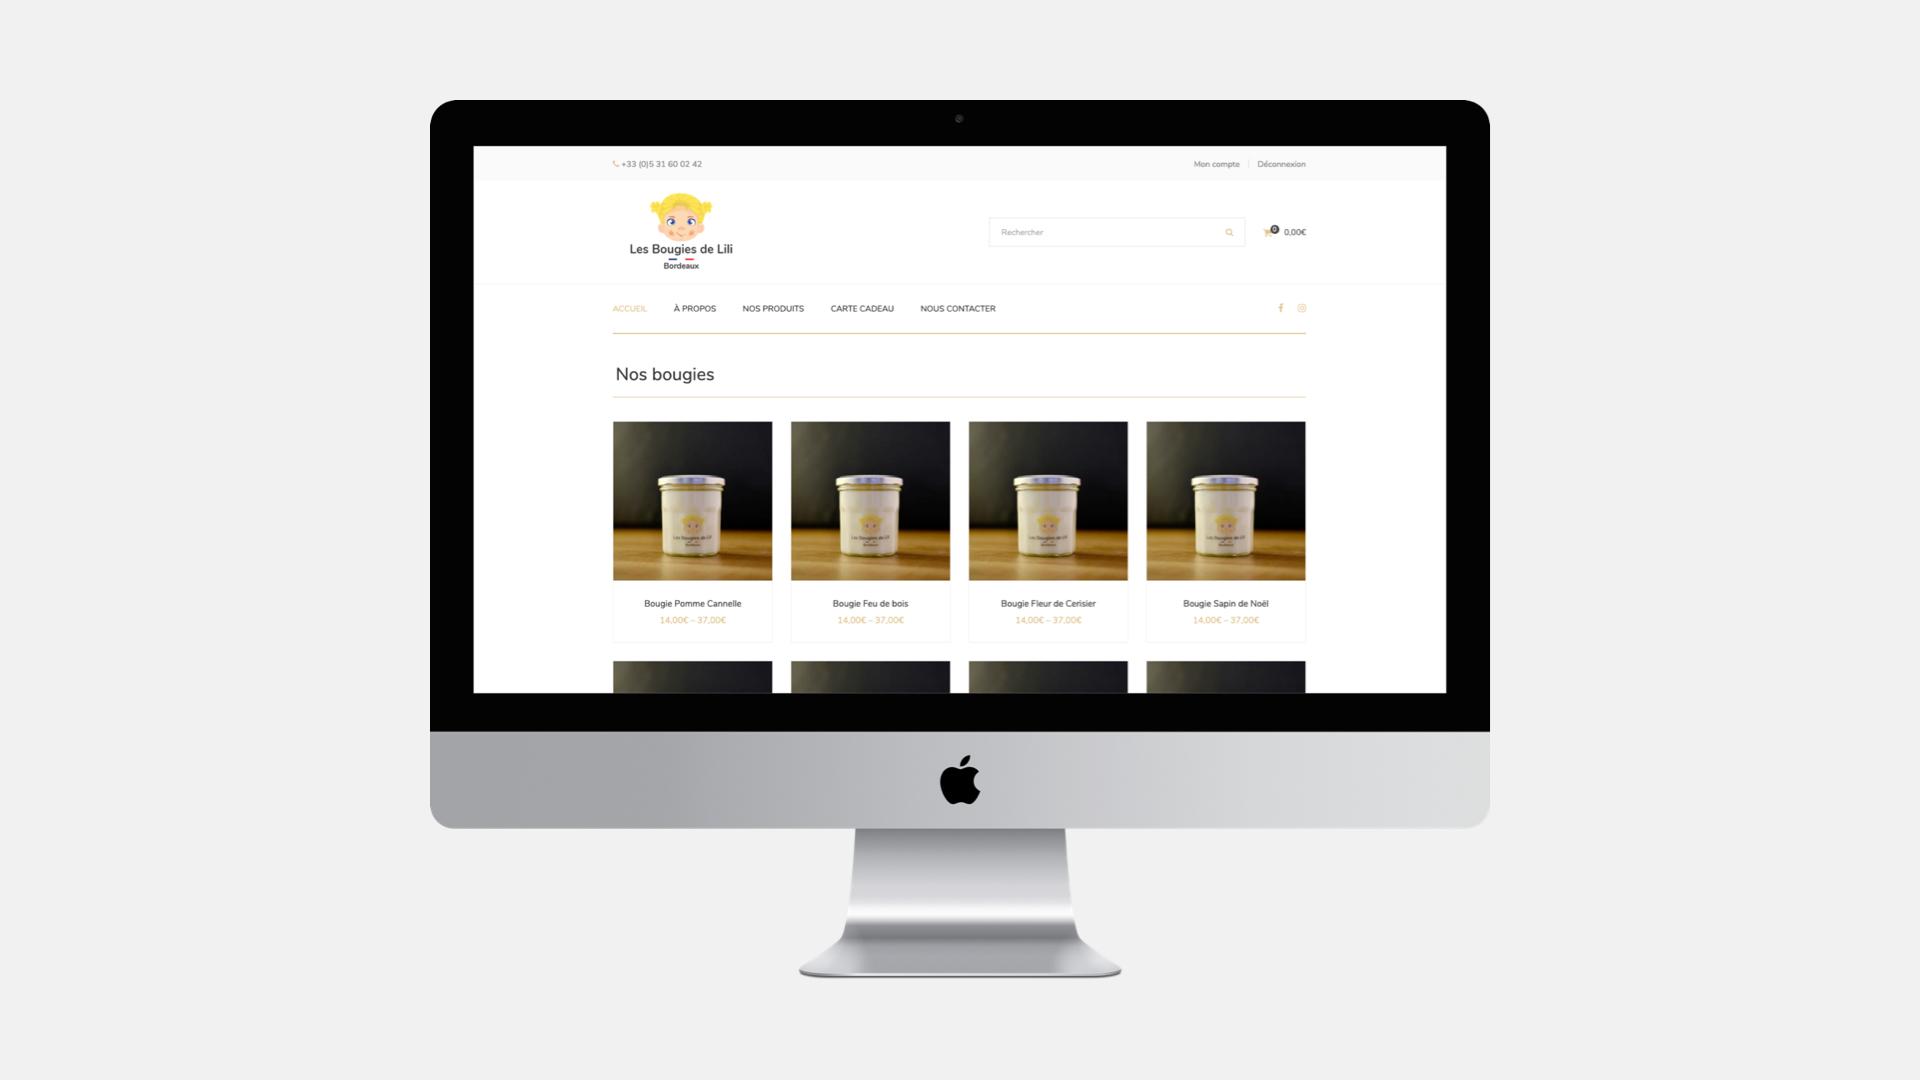 lesbougiesdelili-site-ecommerce-developpeur-freelance-bordeaux-1